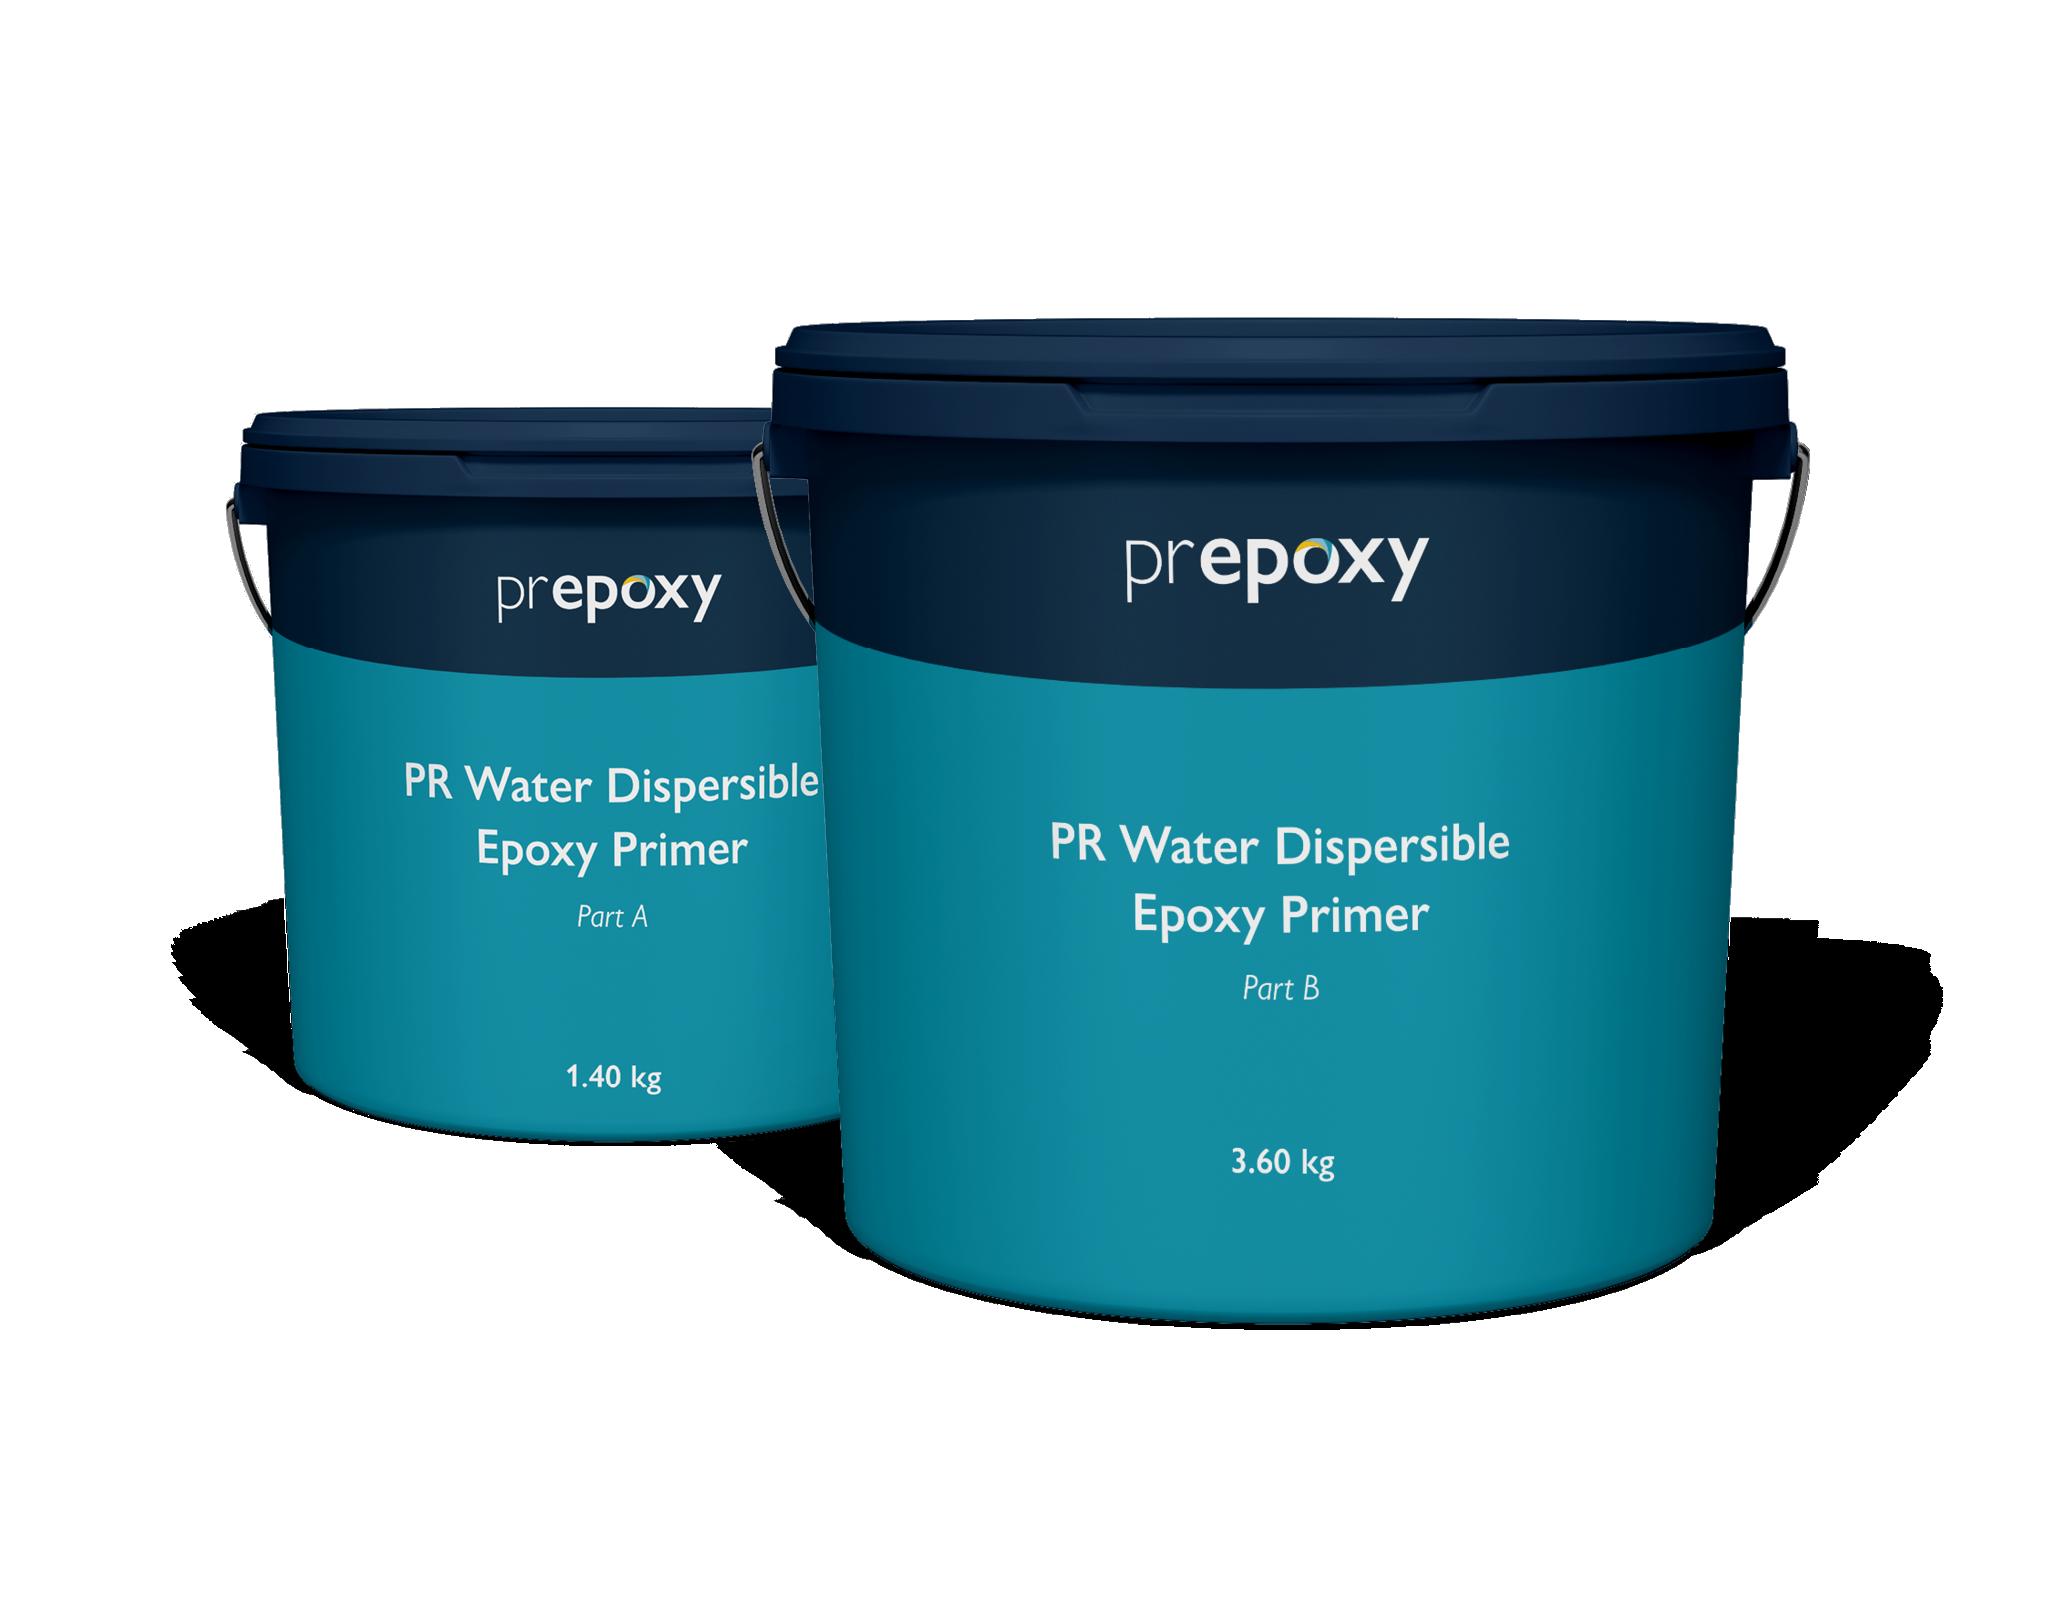 PR Water Dispersible Epoxy Primer